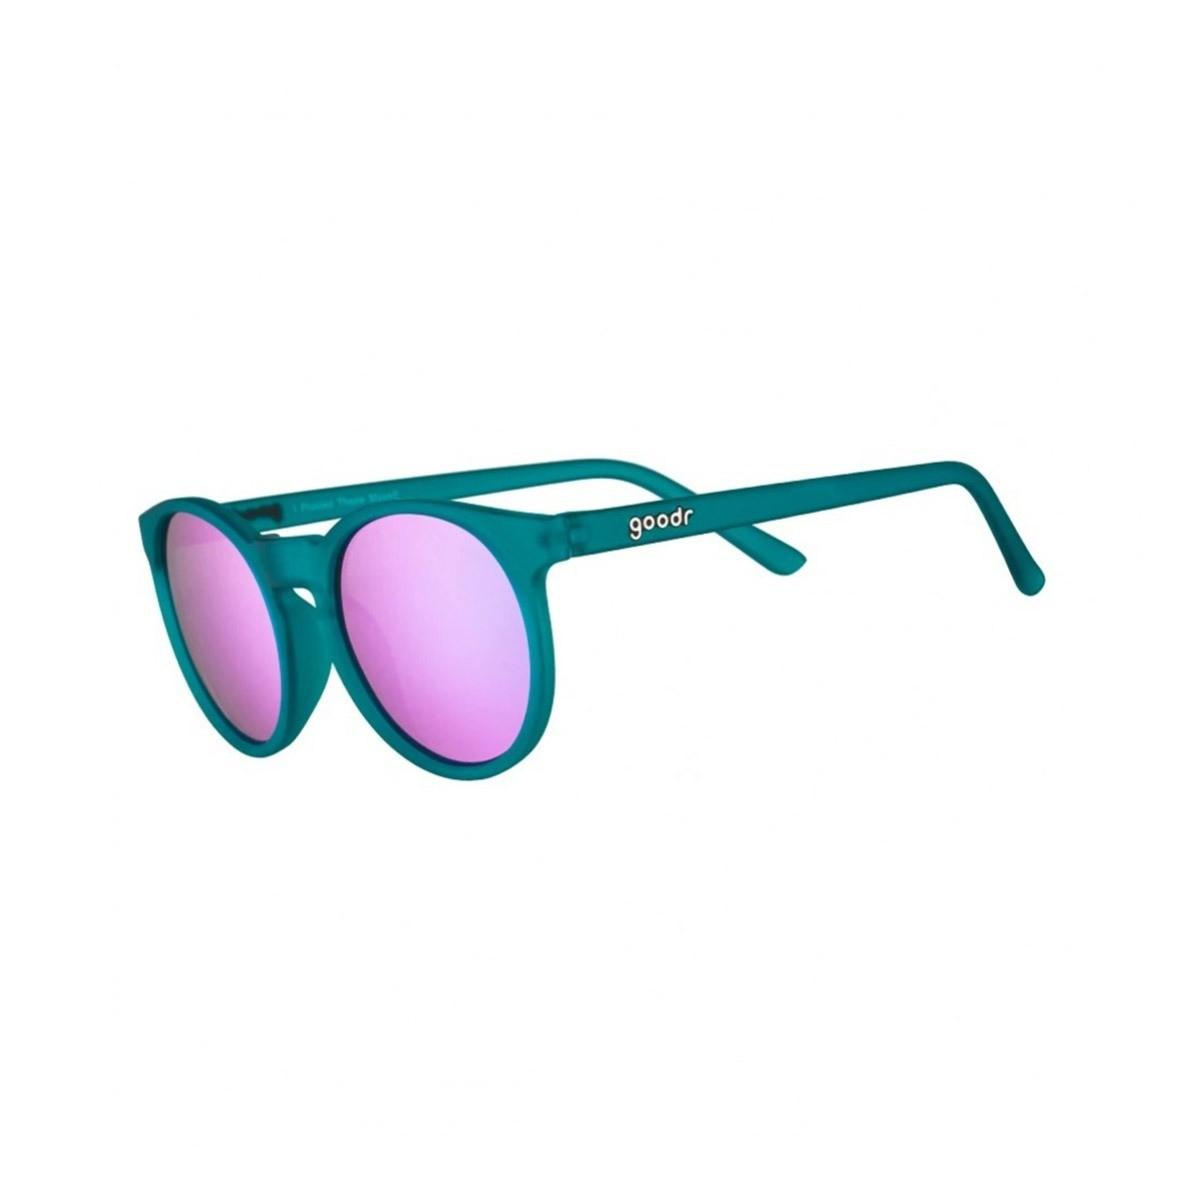 Oculos de Sol Goodr - I Pickled These Myself